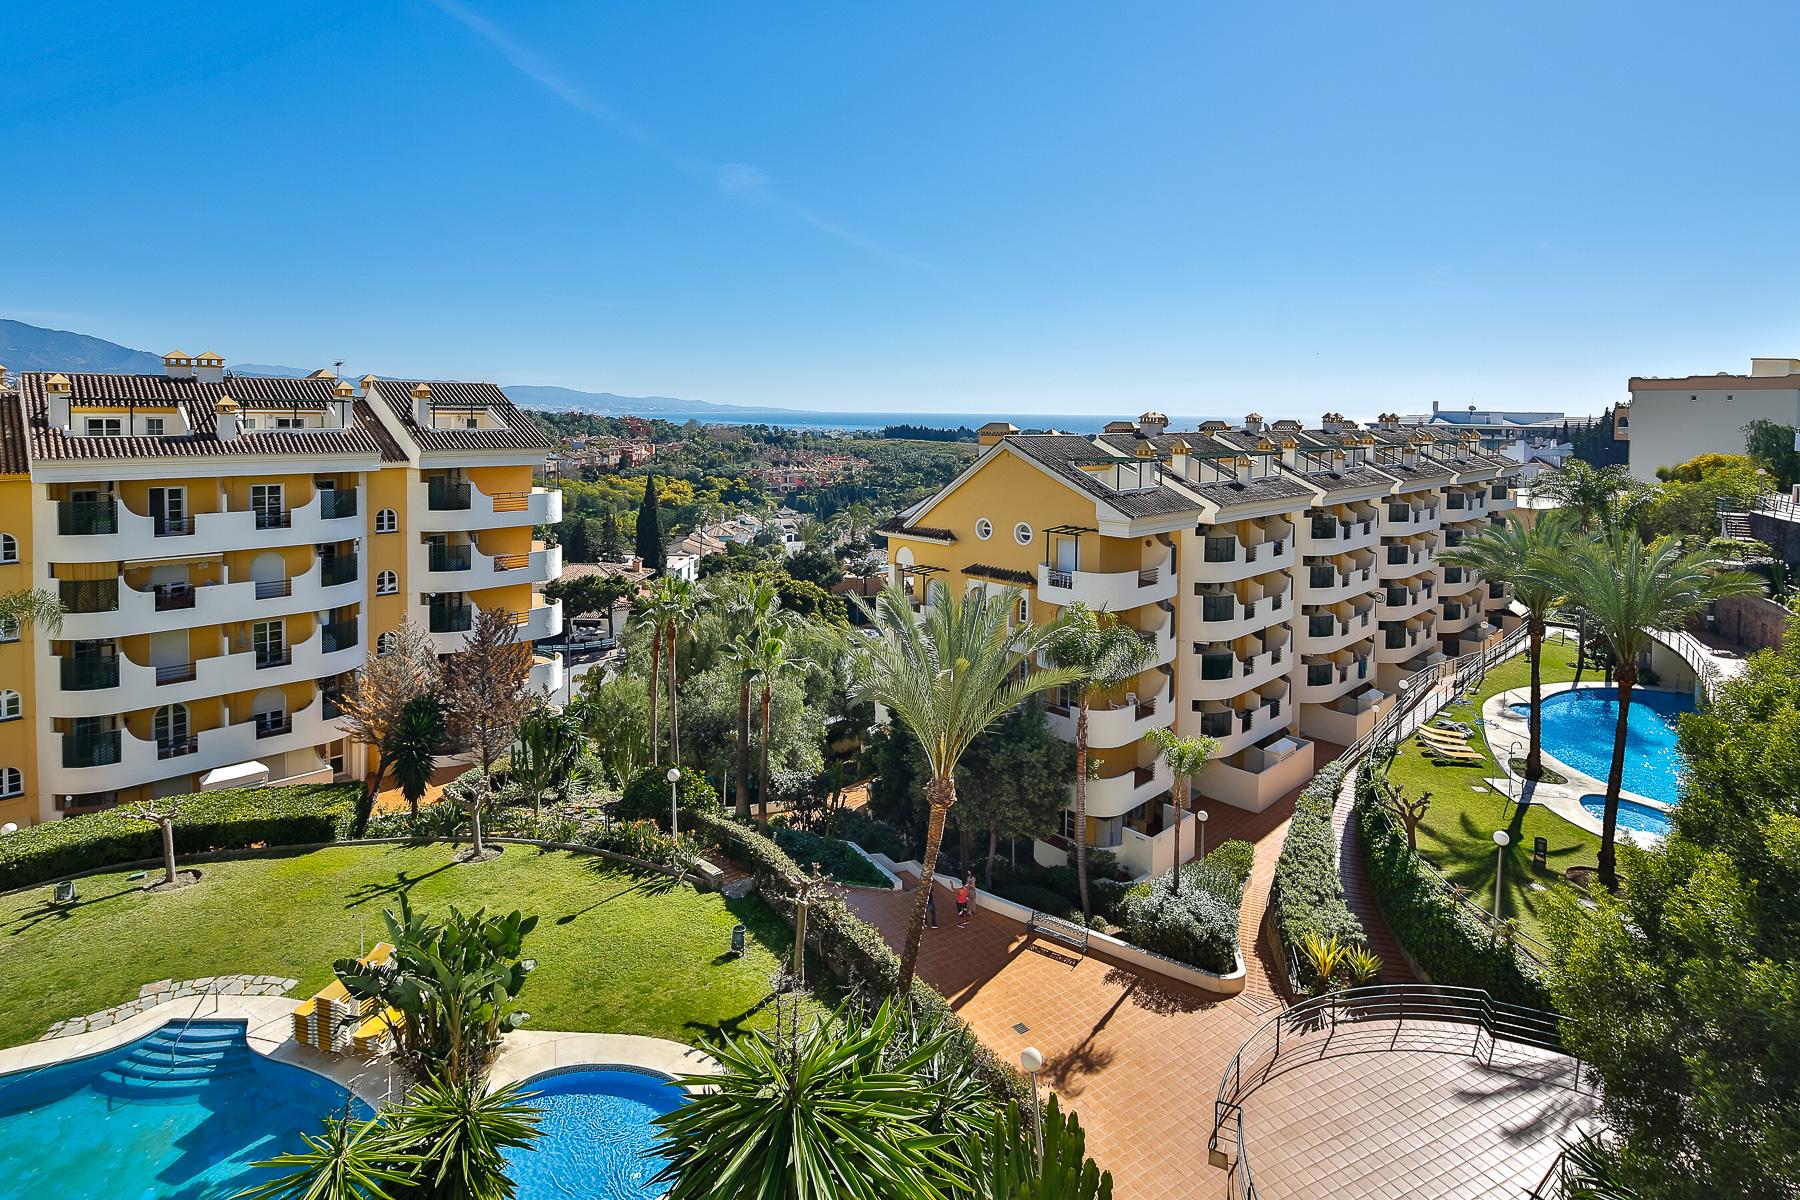 Apartment for Sale in Señorio de Aloha, Nueva Andalucia